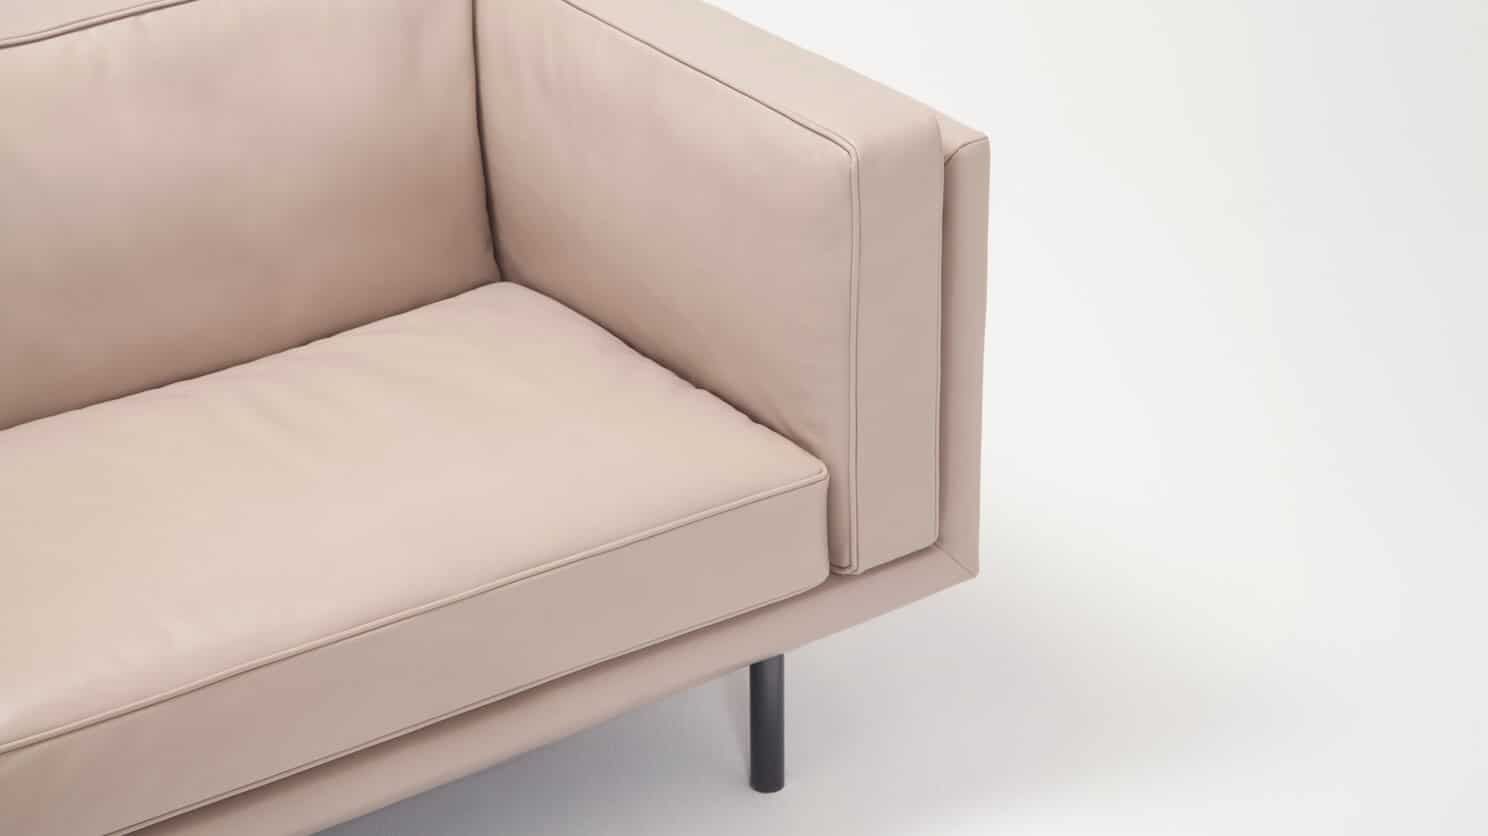 37154 01 03 sofa plateau 84 feather coachella warm grey fron corner view